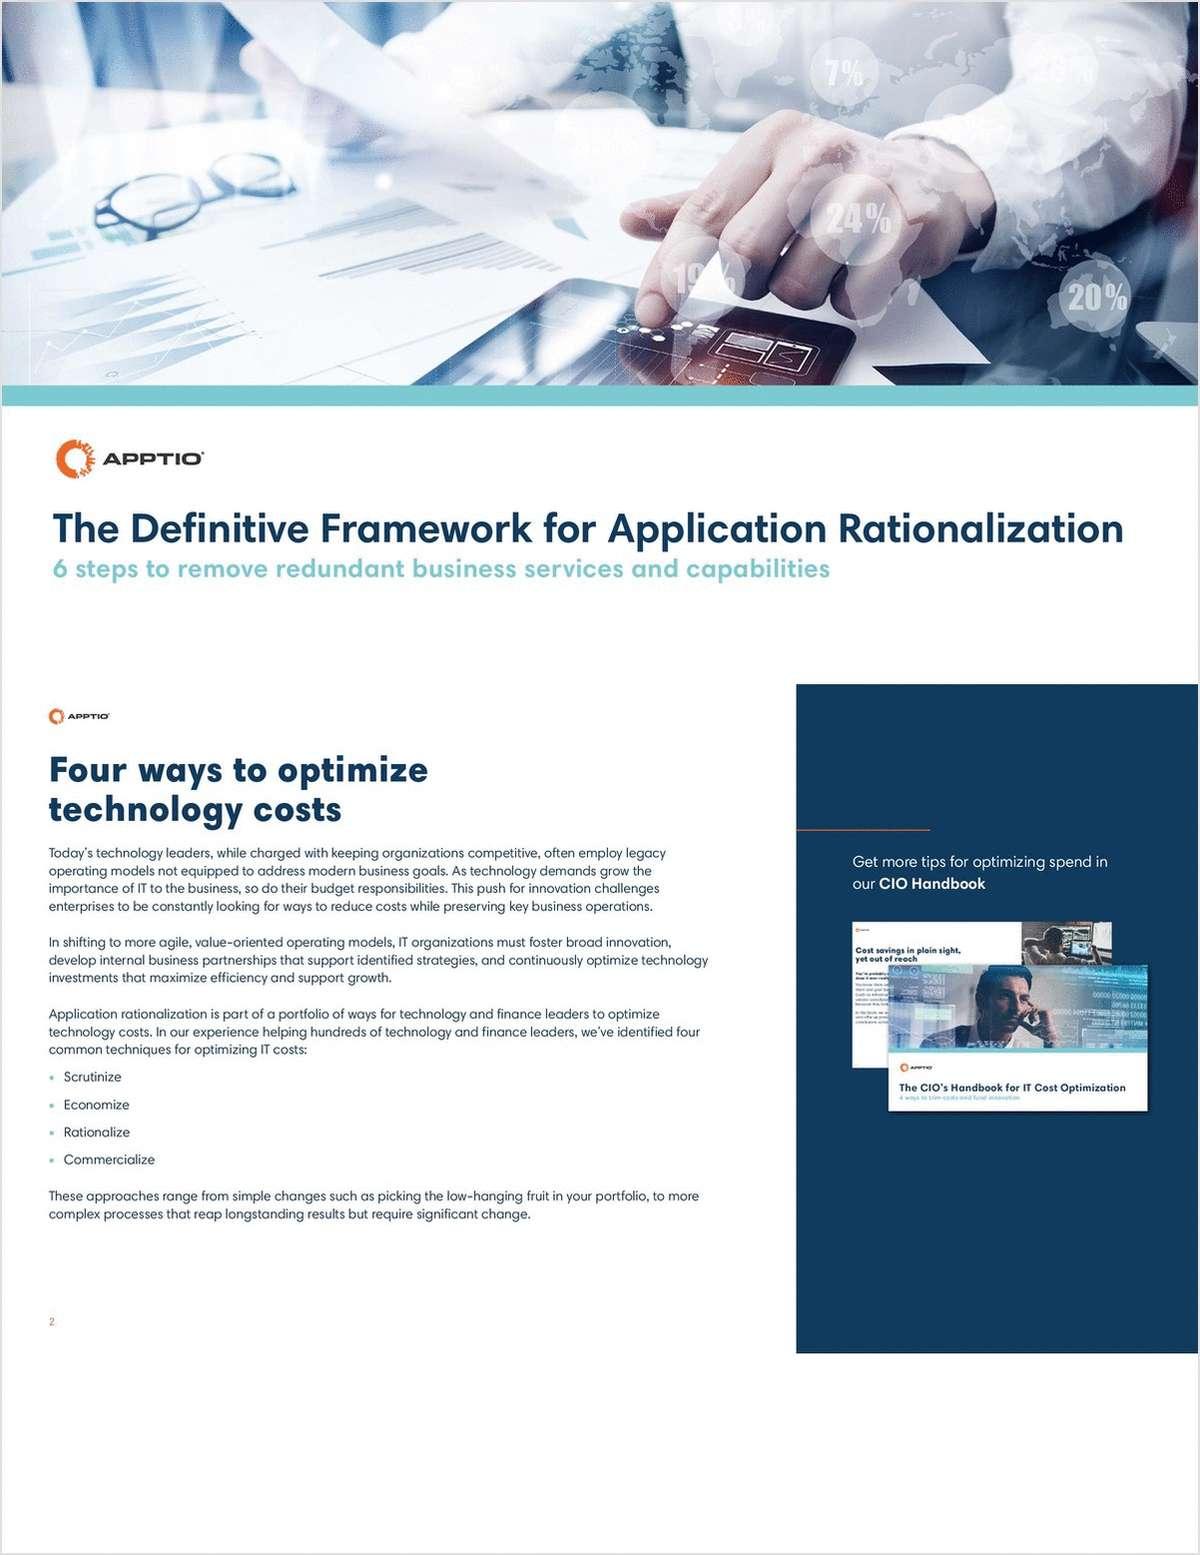 The Definitive Framework for Application Rationalization